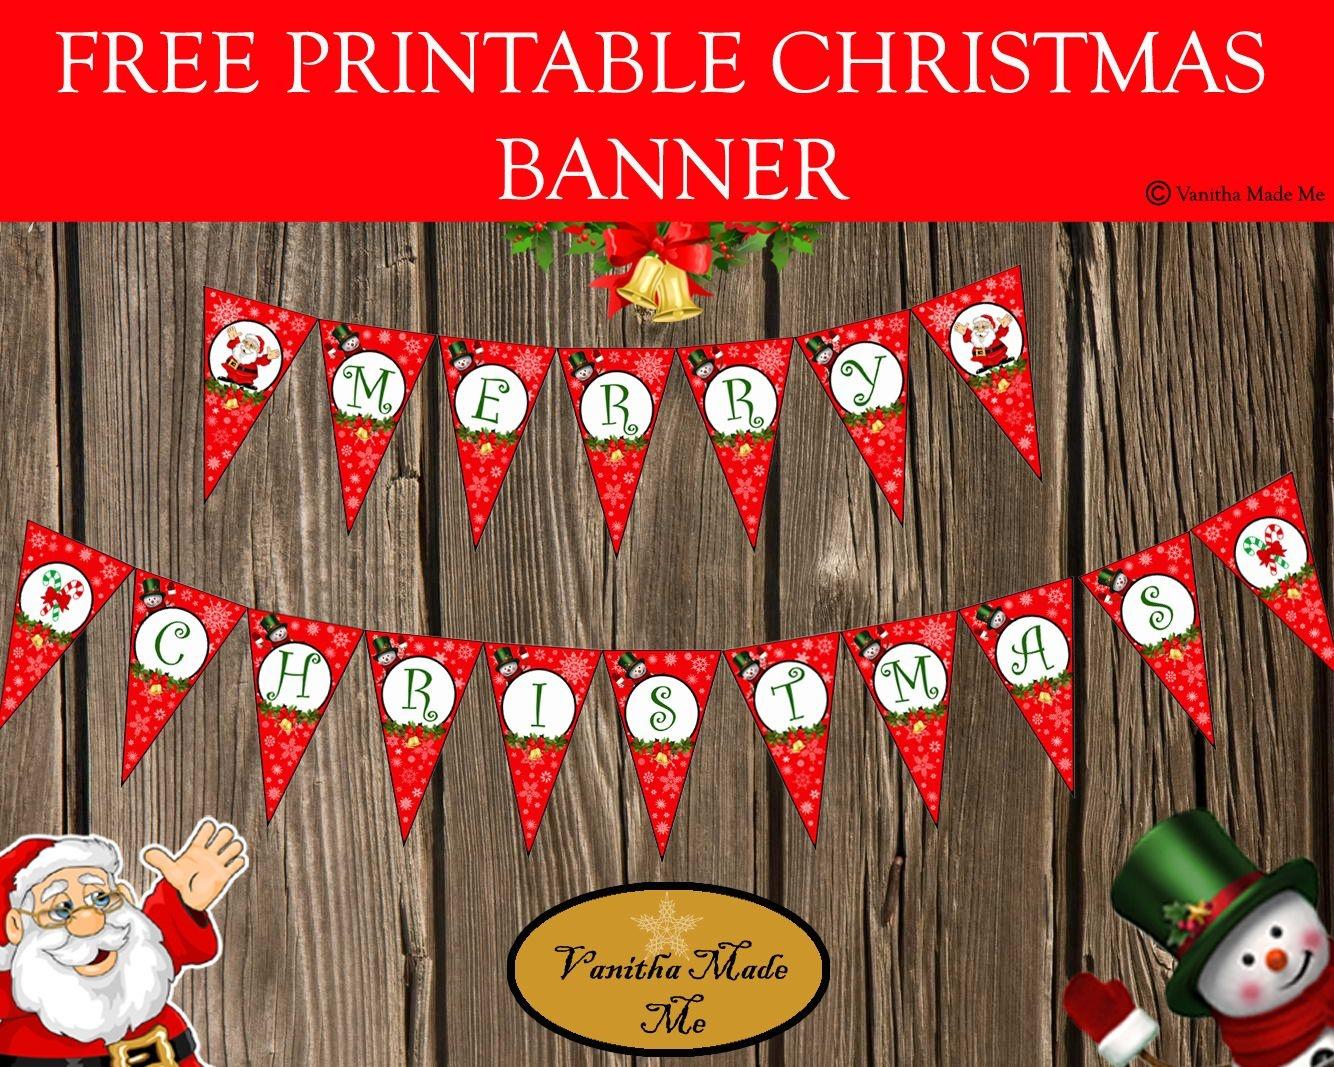 Free Printable Christmas Banner | Kreatívságok - Free Printable Christmas Banner